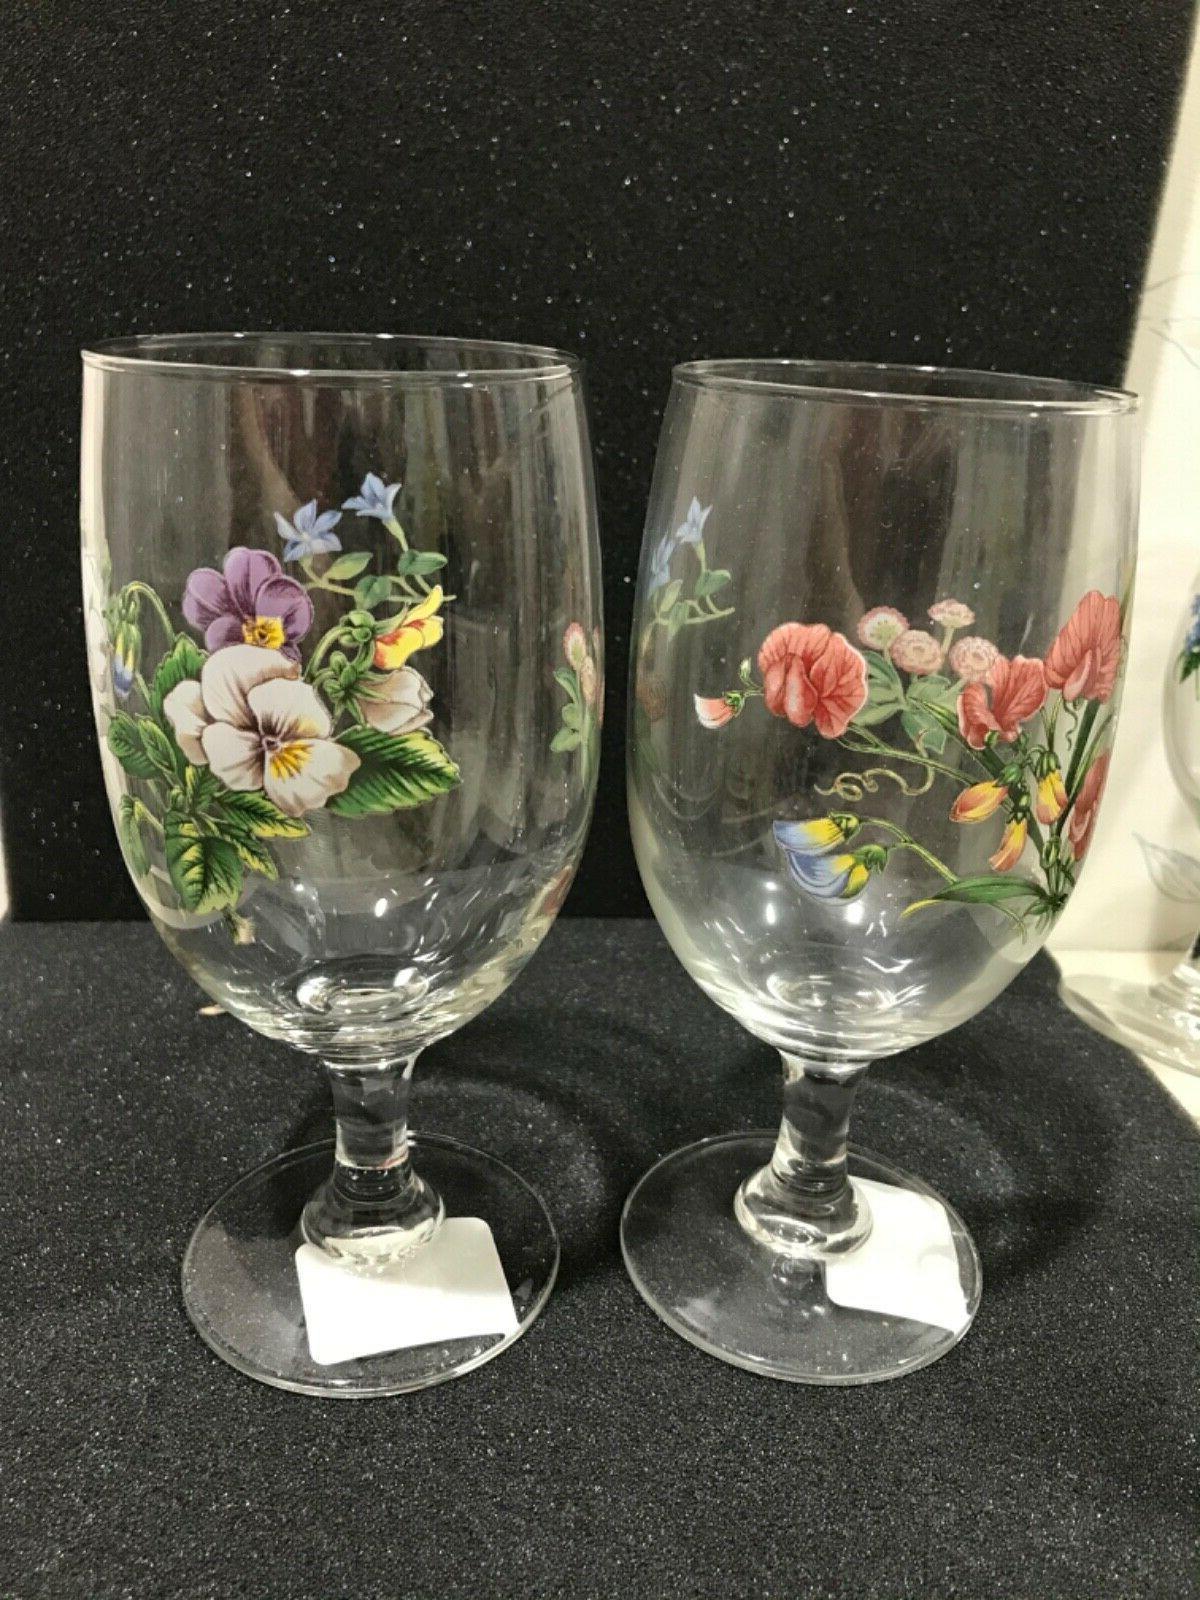 4 ICED TEA GLASS SET SHORT BOWL